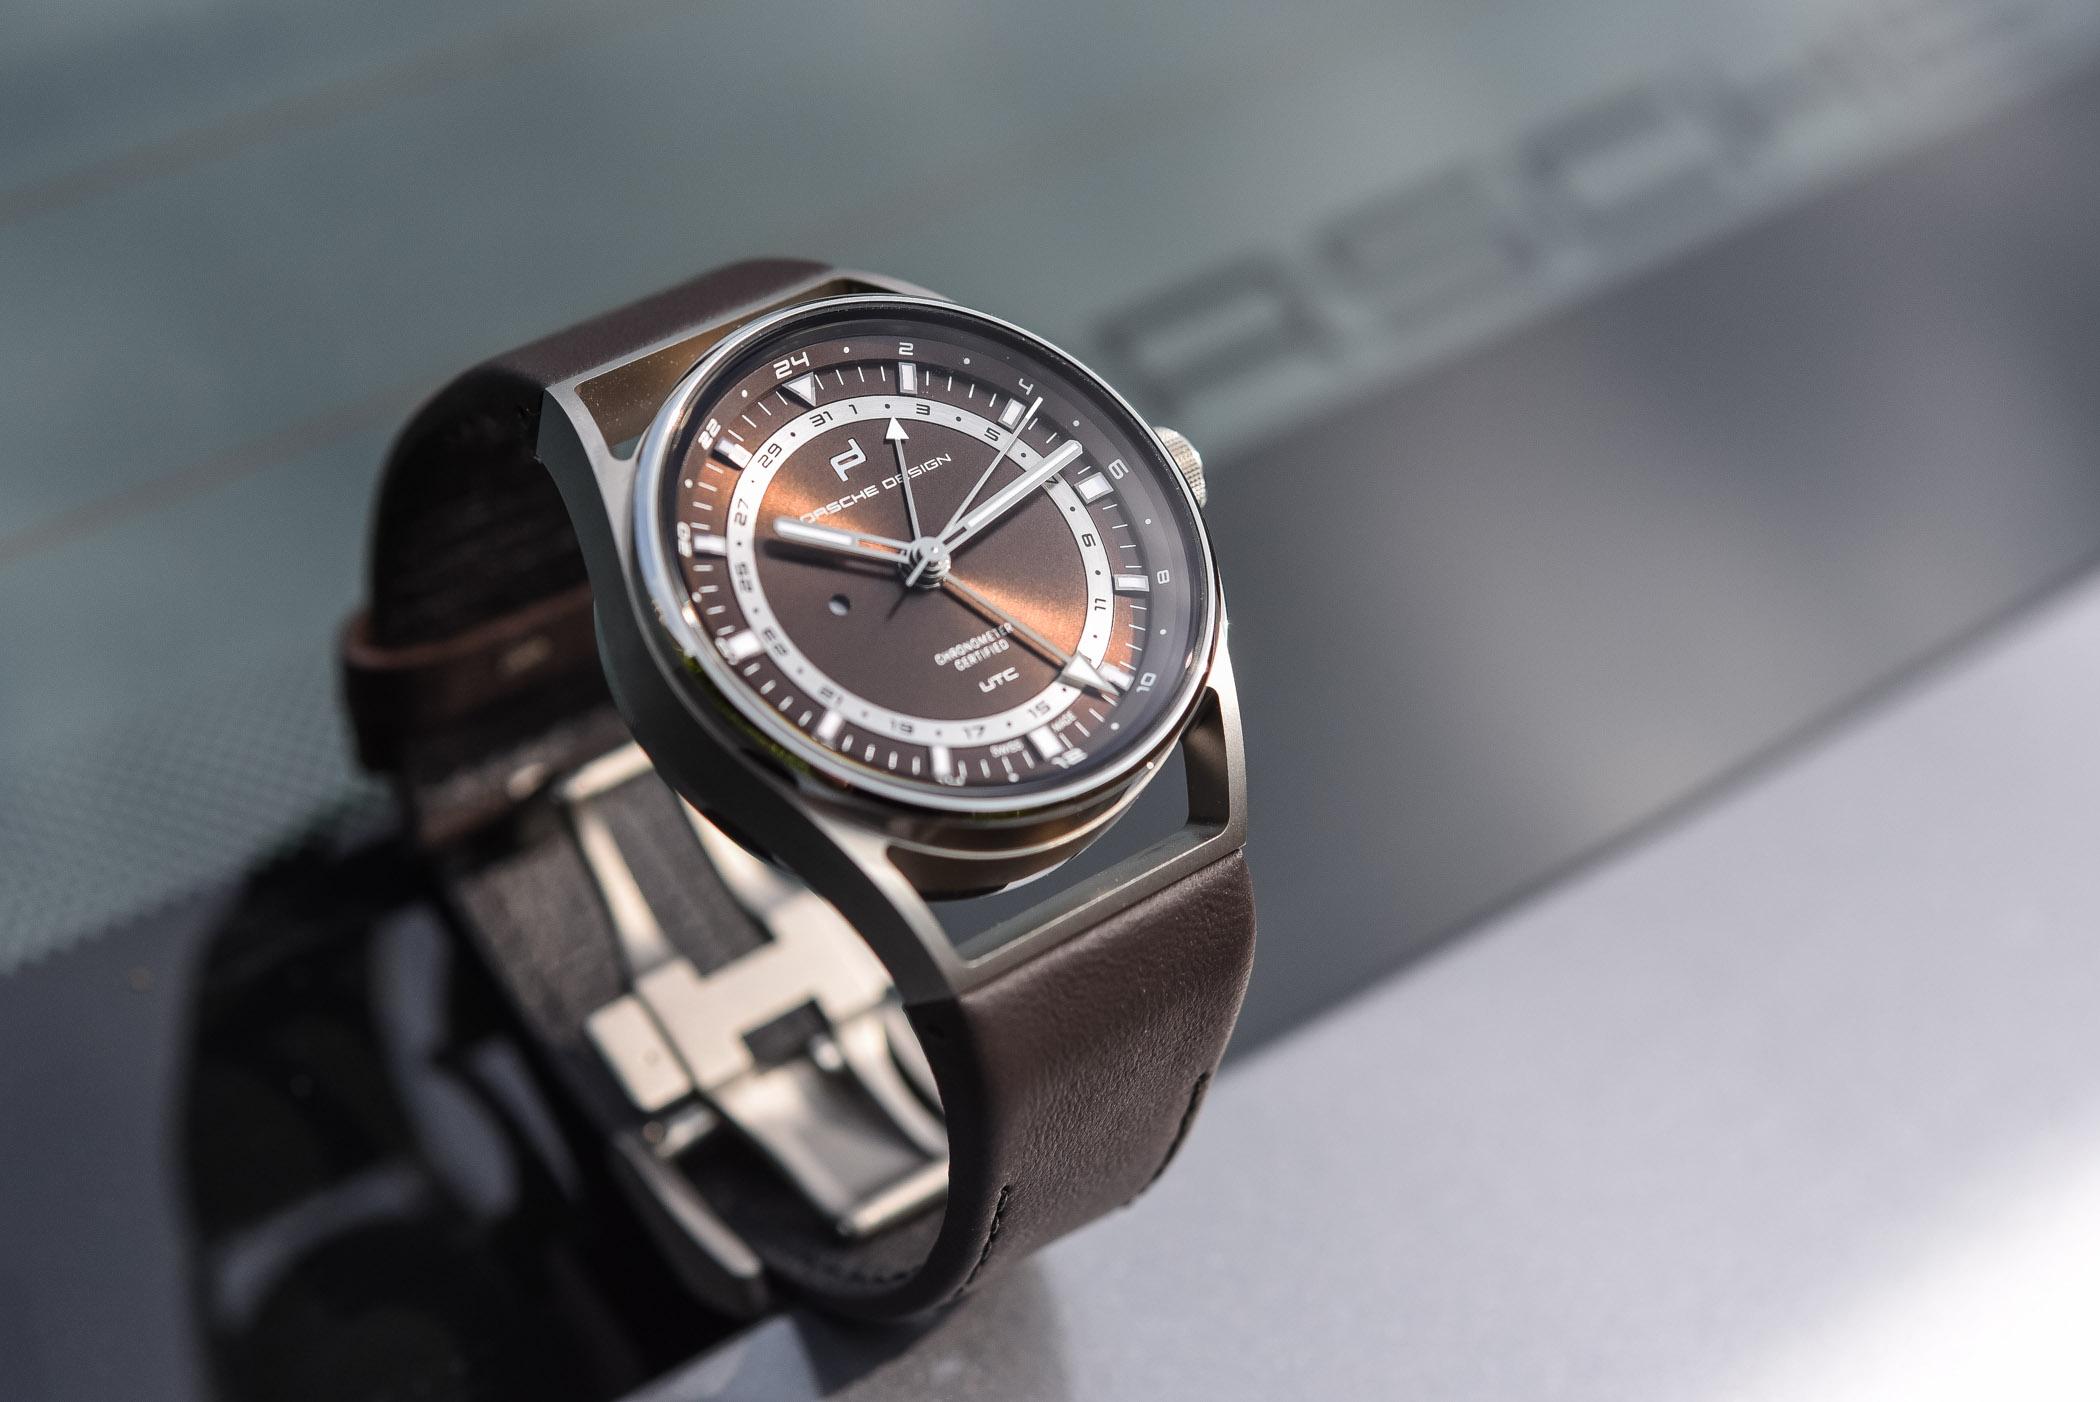 Porsche Design 1919 Globetimer UTC